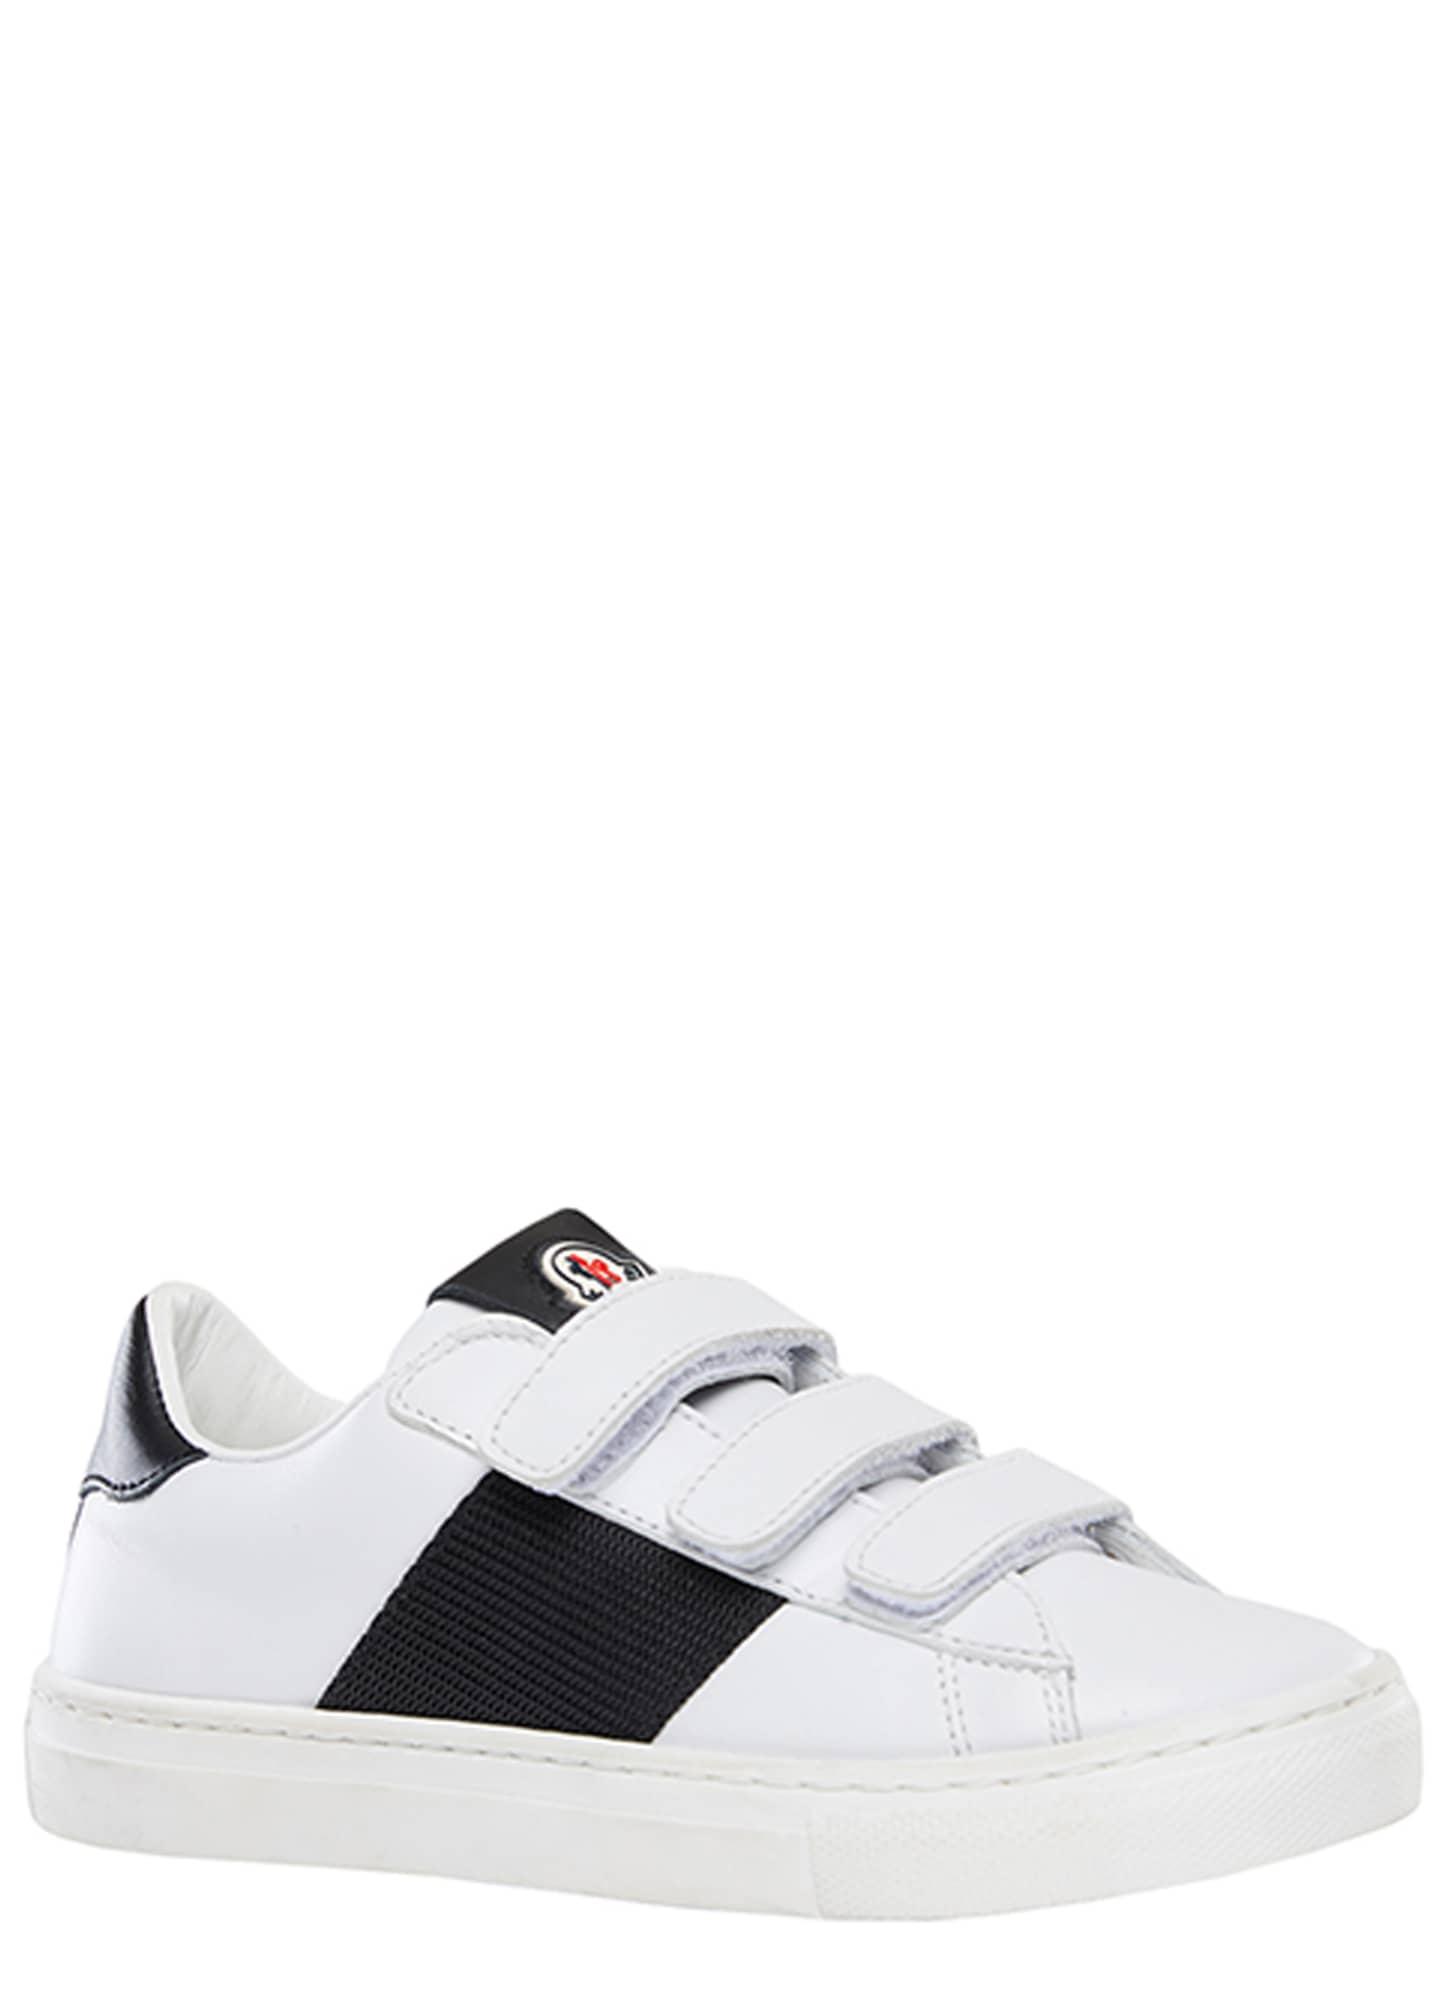 Moncler Mel Leather Grip-Strap Sneakers, Toddler/Kids